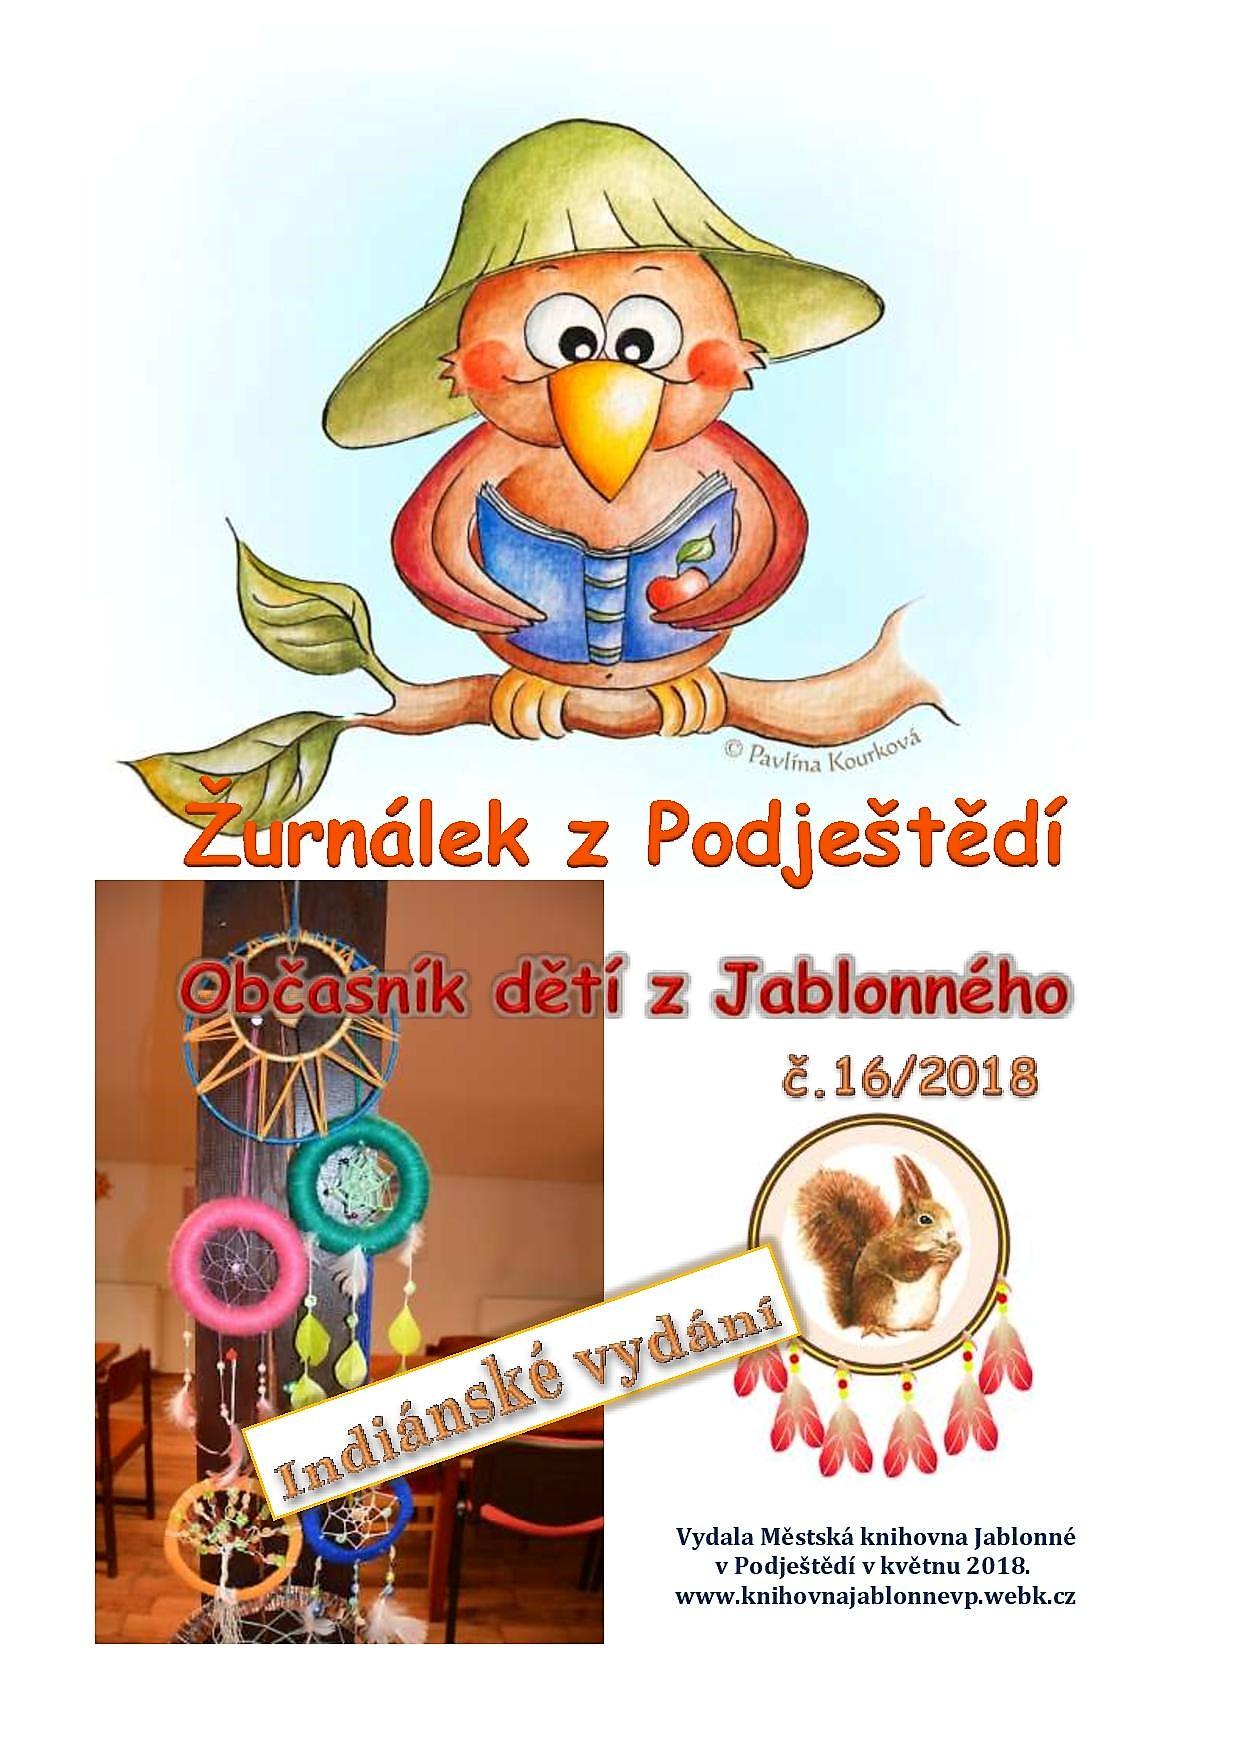 OBRÁZEK : urnalek_jaro_2018-page-001.jpg